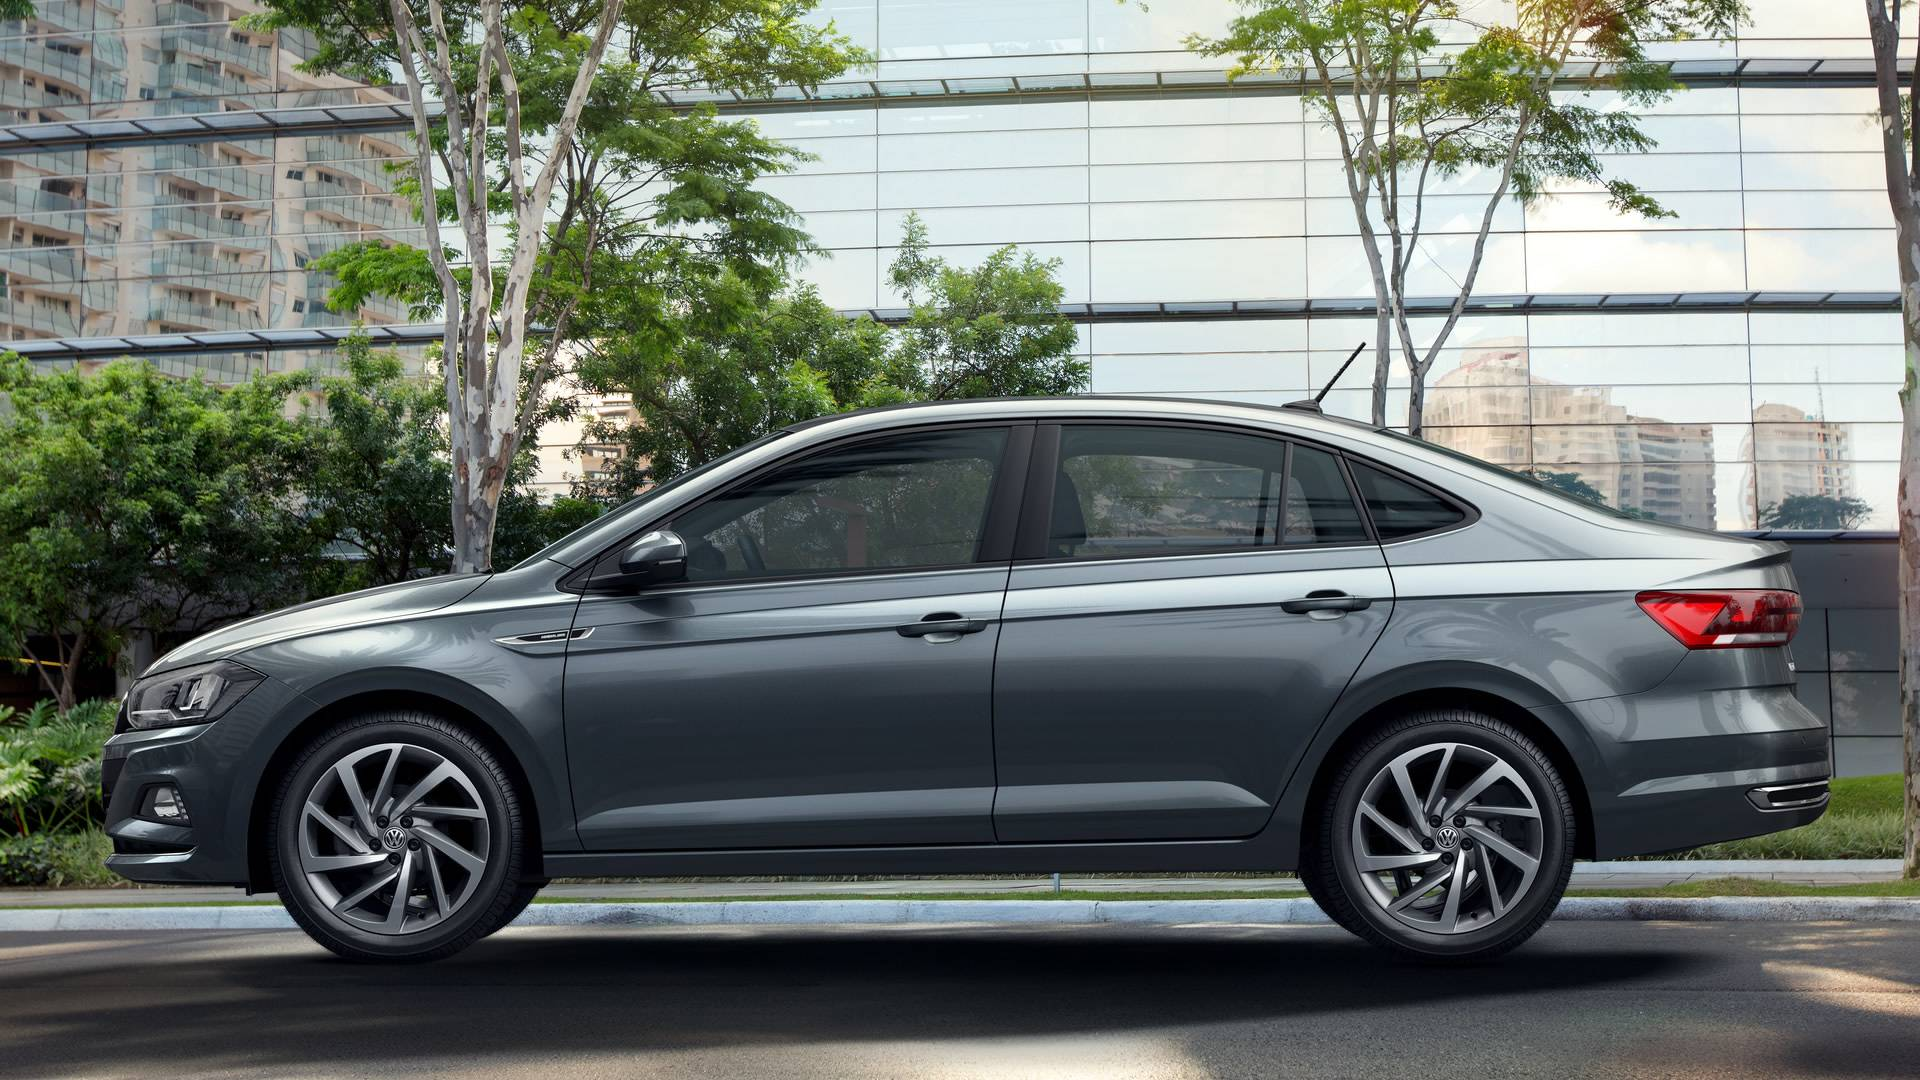 2018 VW Virtus (Polo based sedan) side view